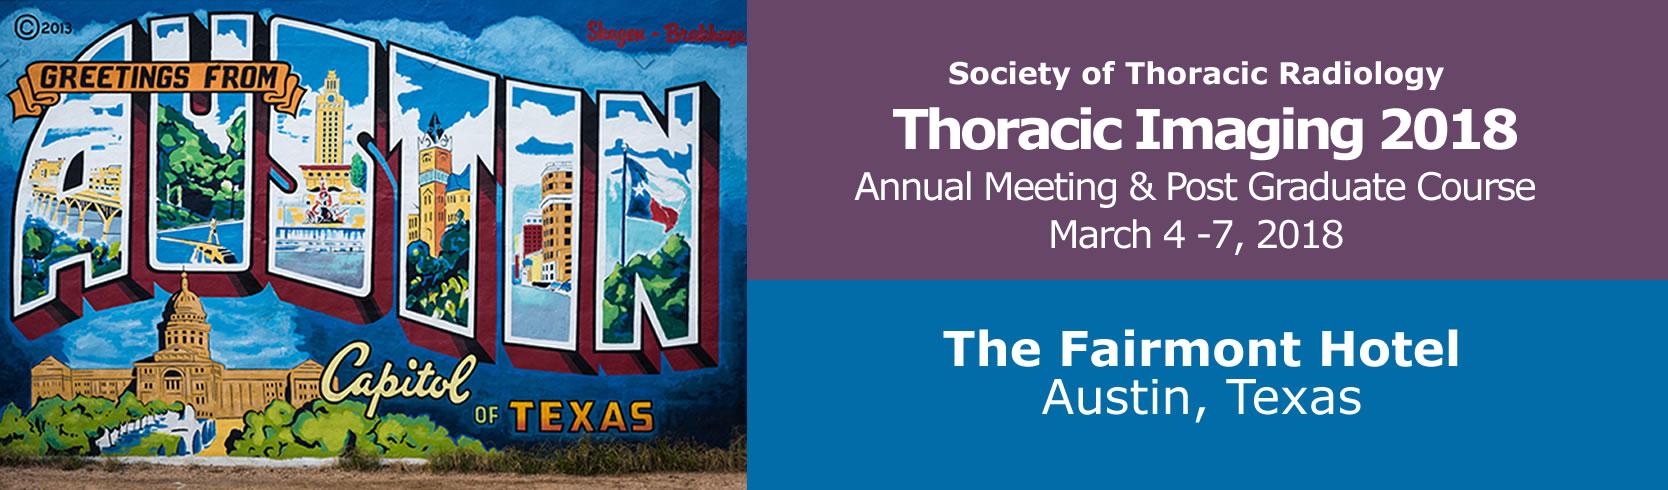 Society of Thoracic Radiology